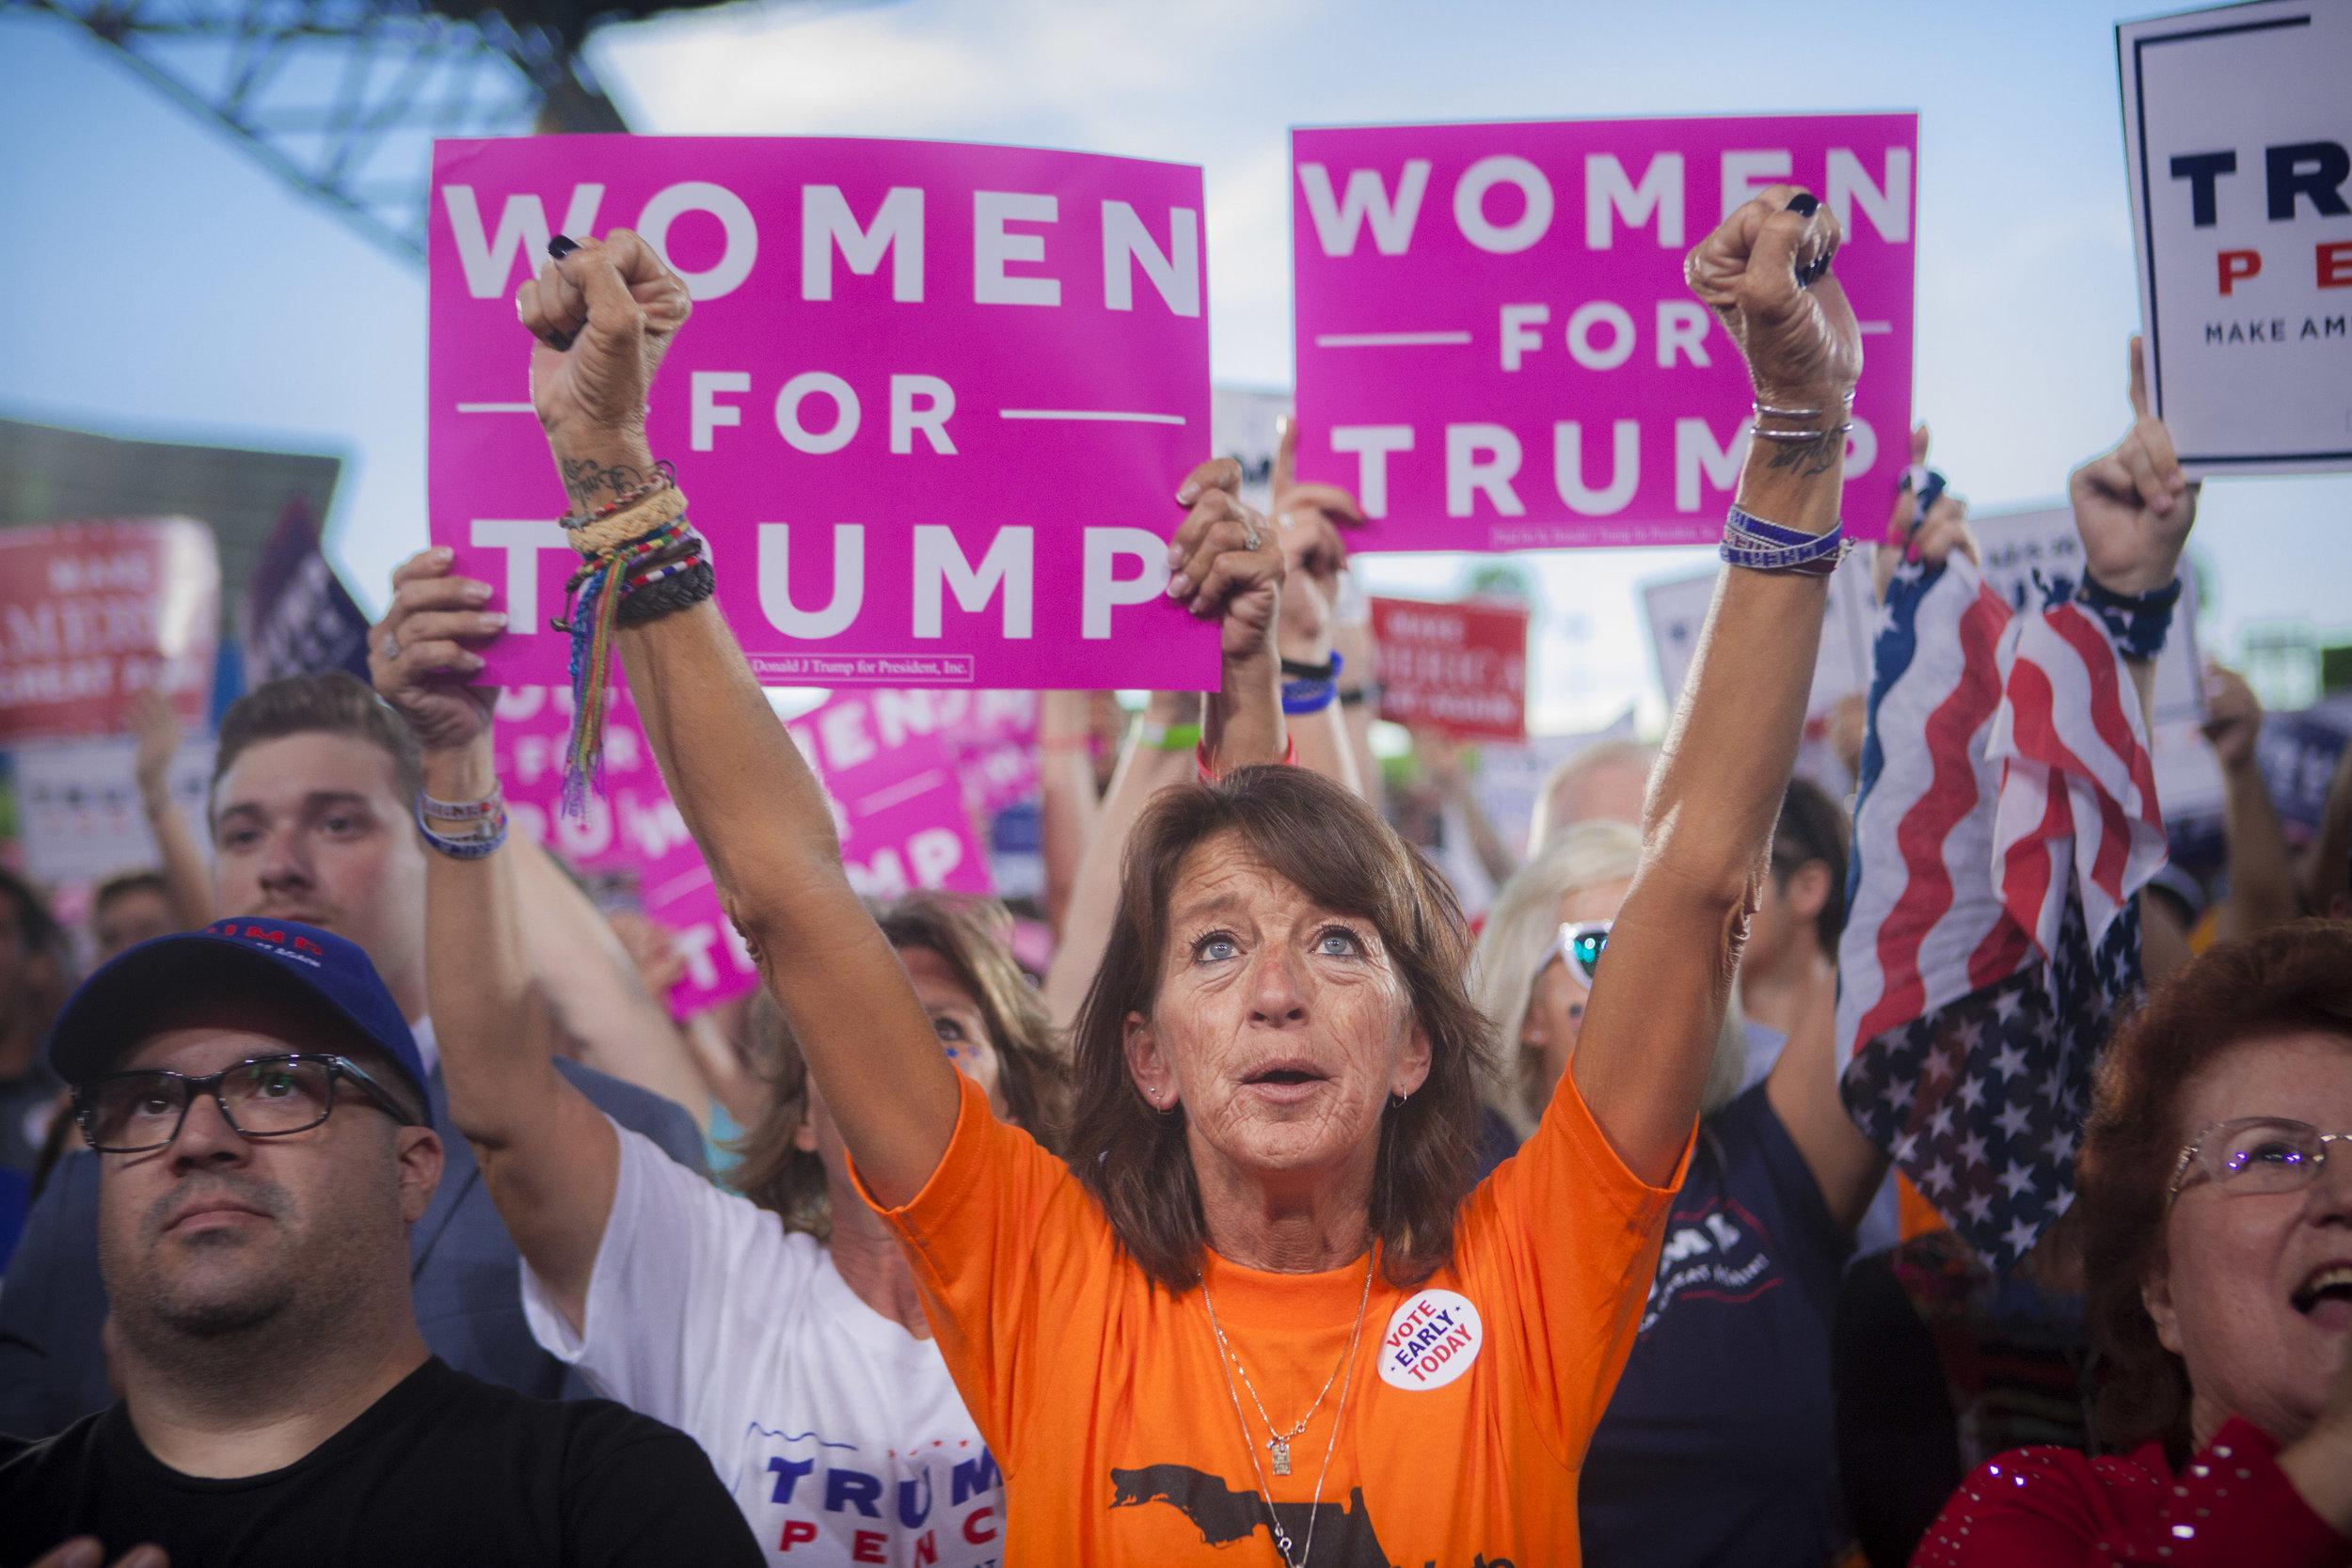 10242016_BJM_Donald_Trump_Campaigns_in_Tampa_Florida_29.jpg